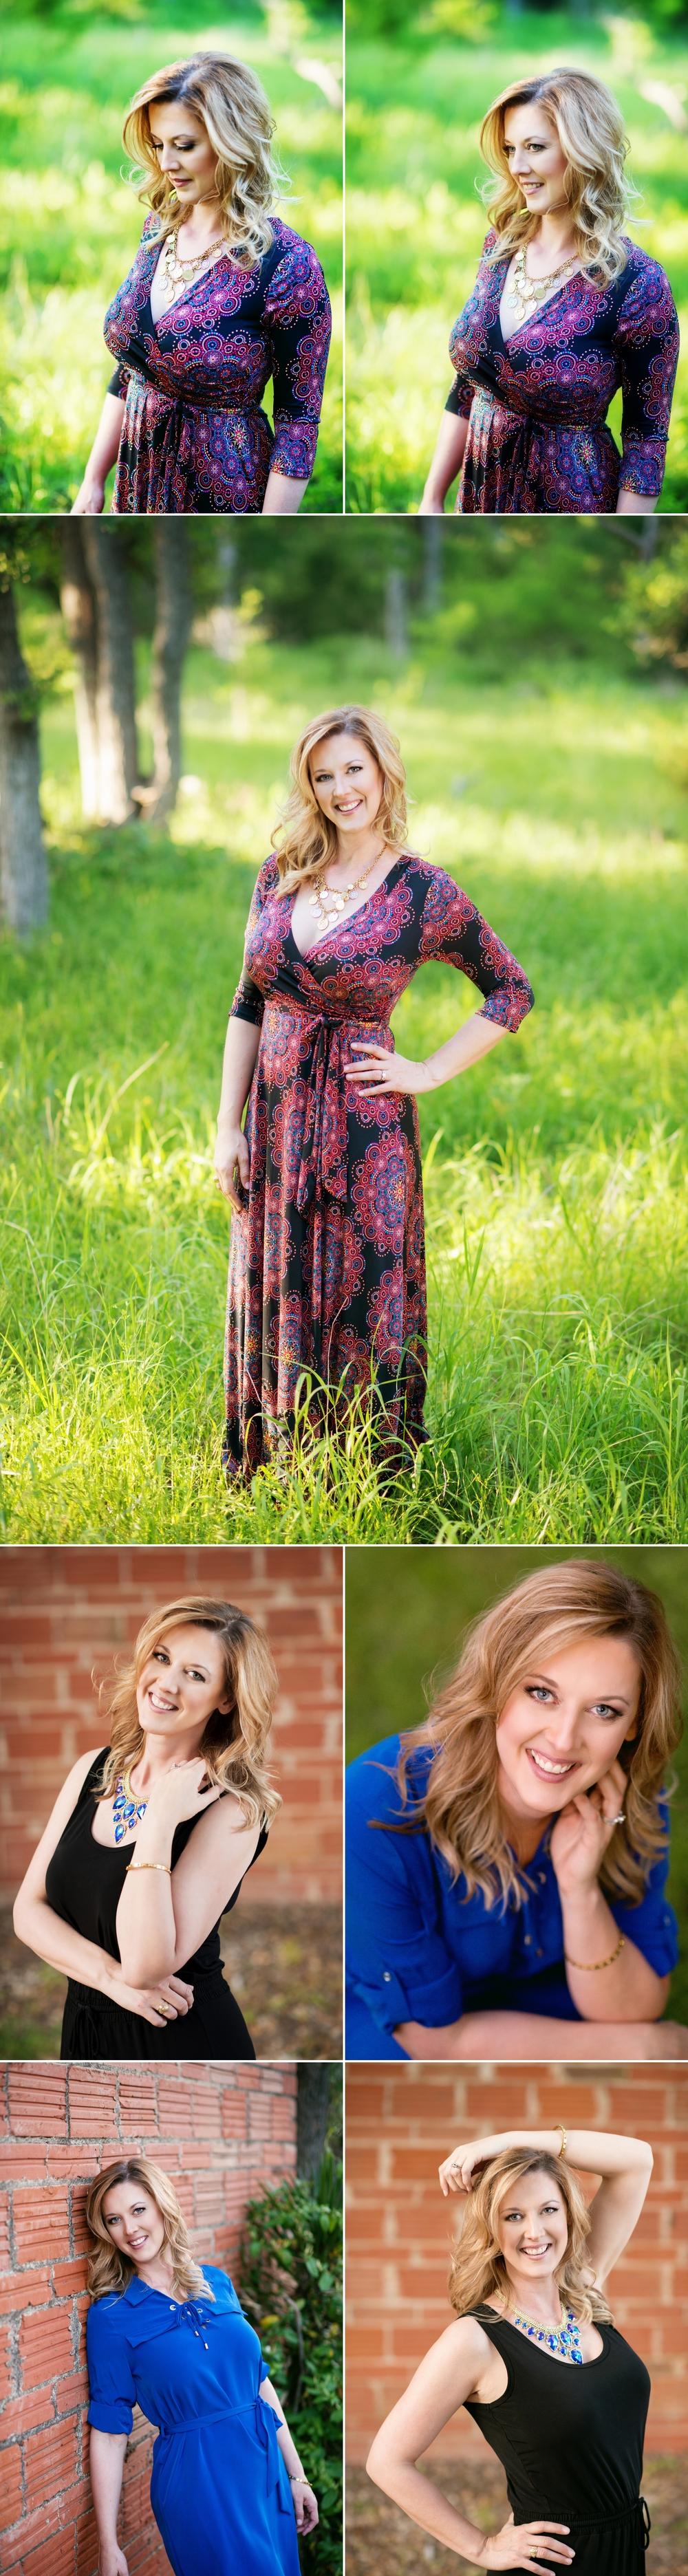 Meet Heidi Knight of Heidi Knight Photography